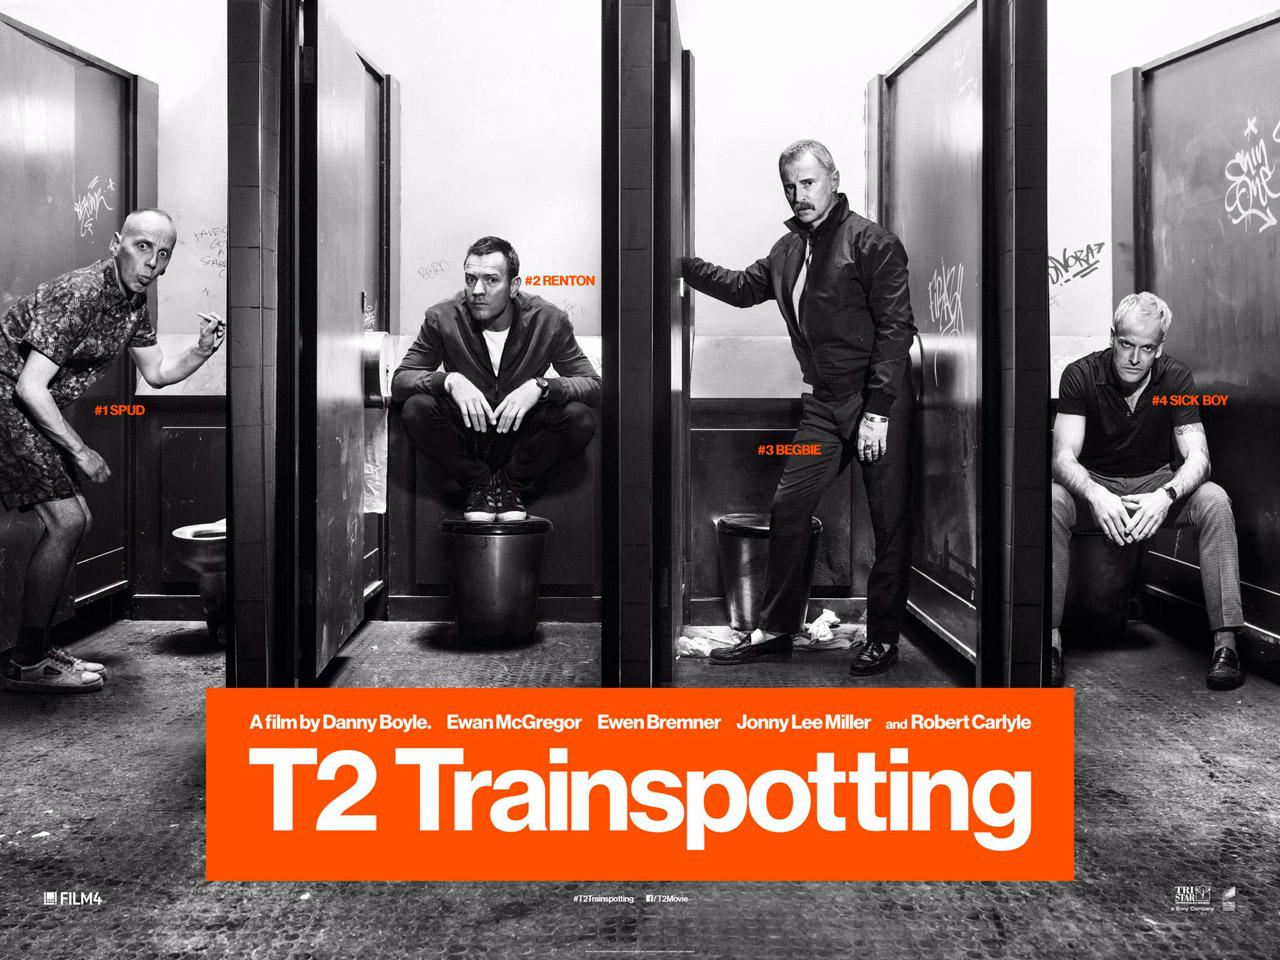 szmk_trainspotting_2_3.jpg